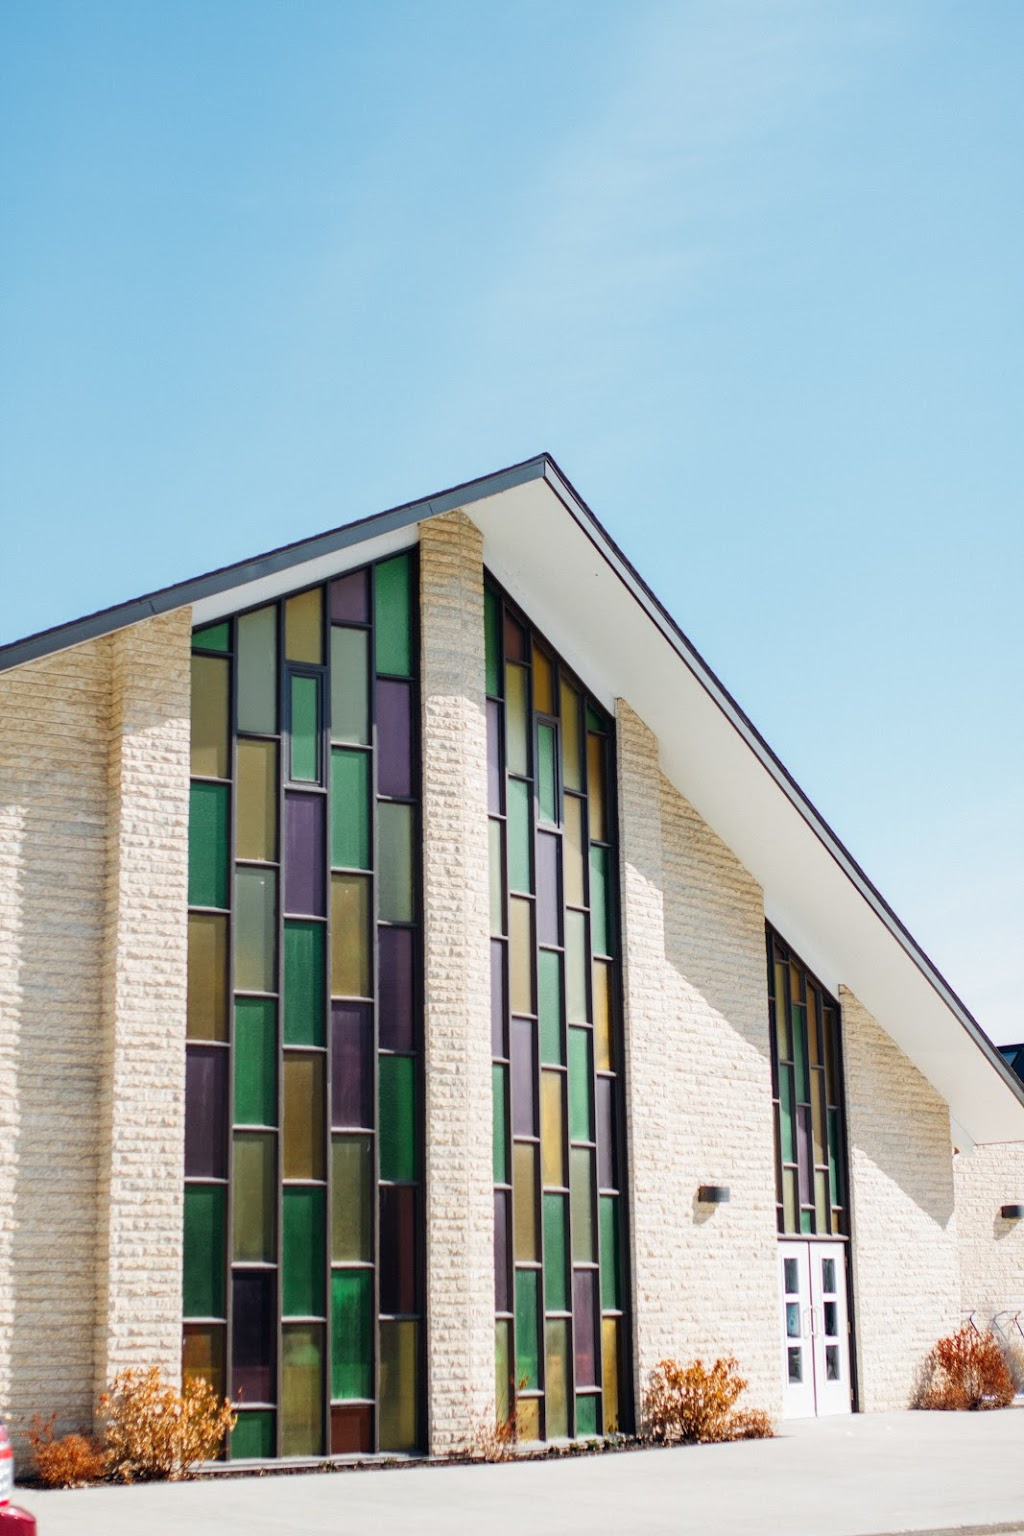 Pathway Community Church | church | 252 6 St, Winkler, MB R6W 0A9, Canada | 2043321616 OR +1 204-332-1616